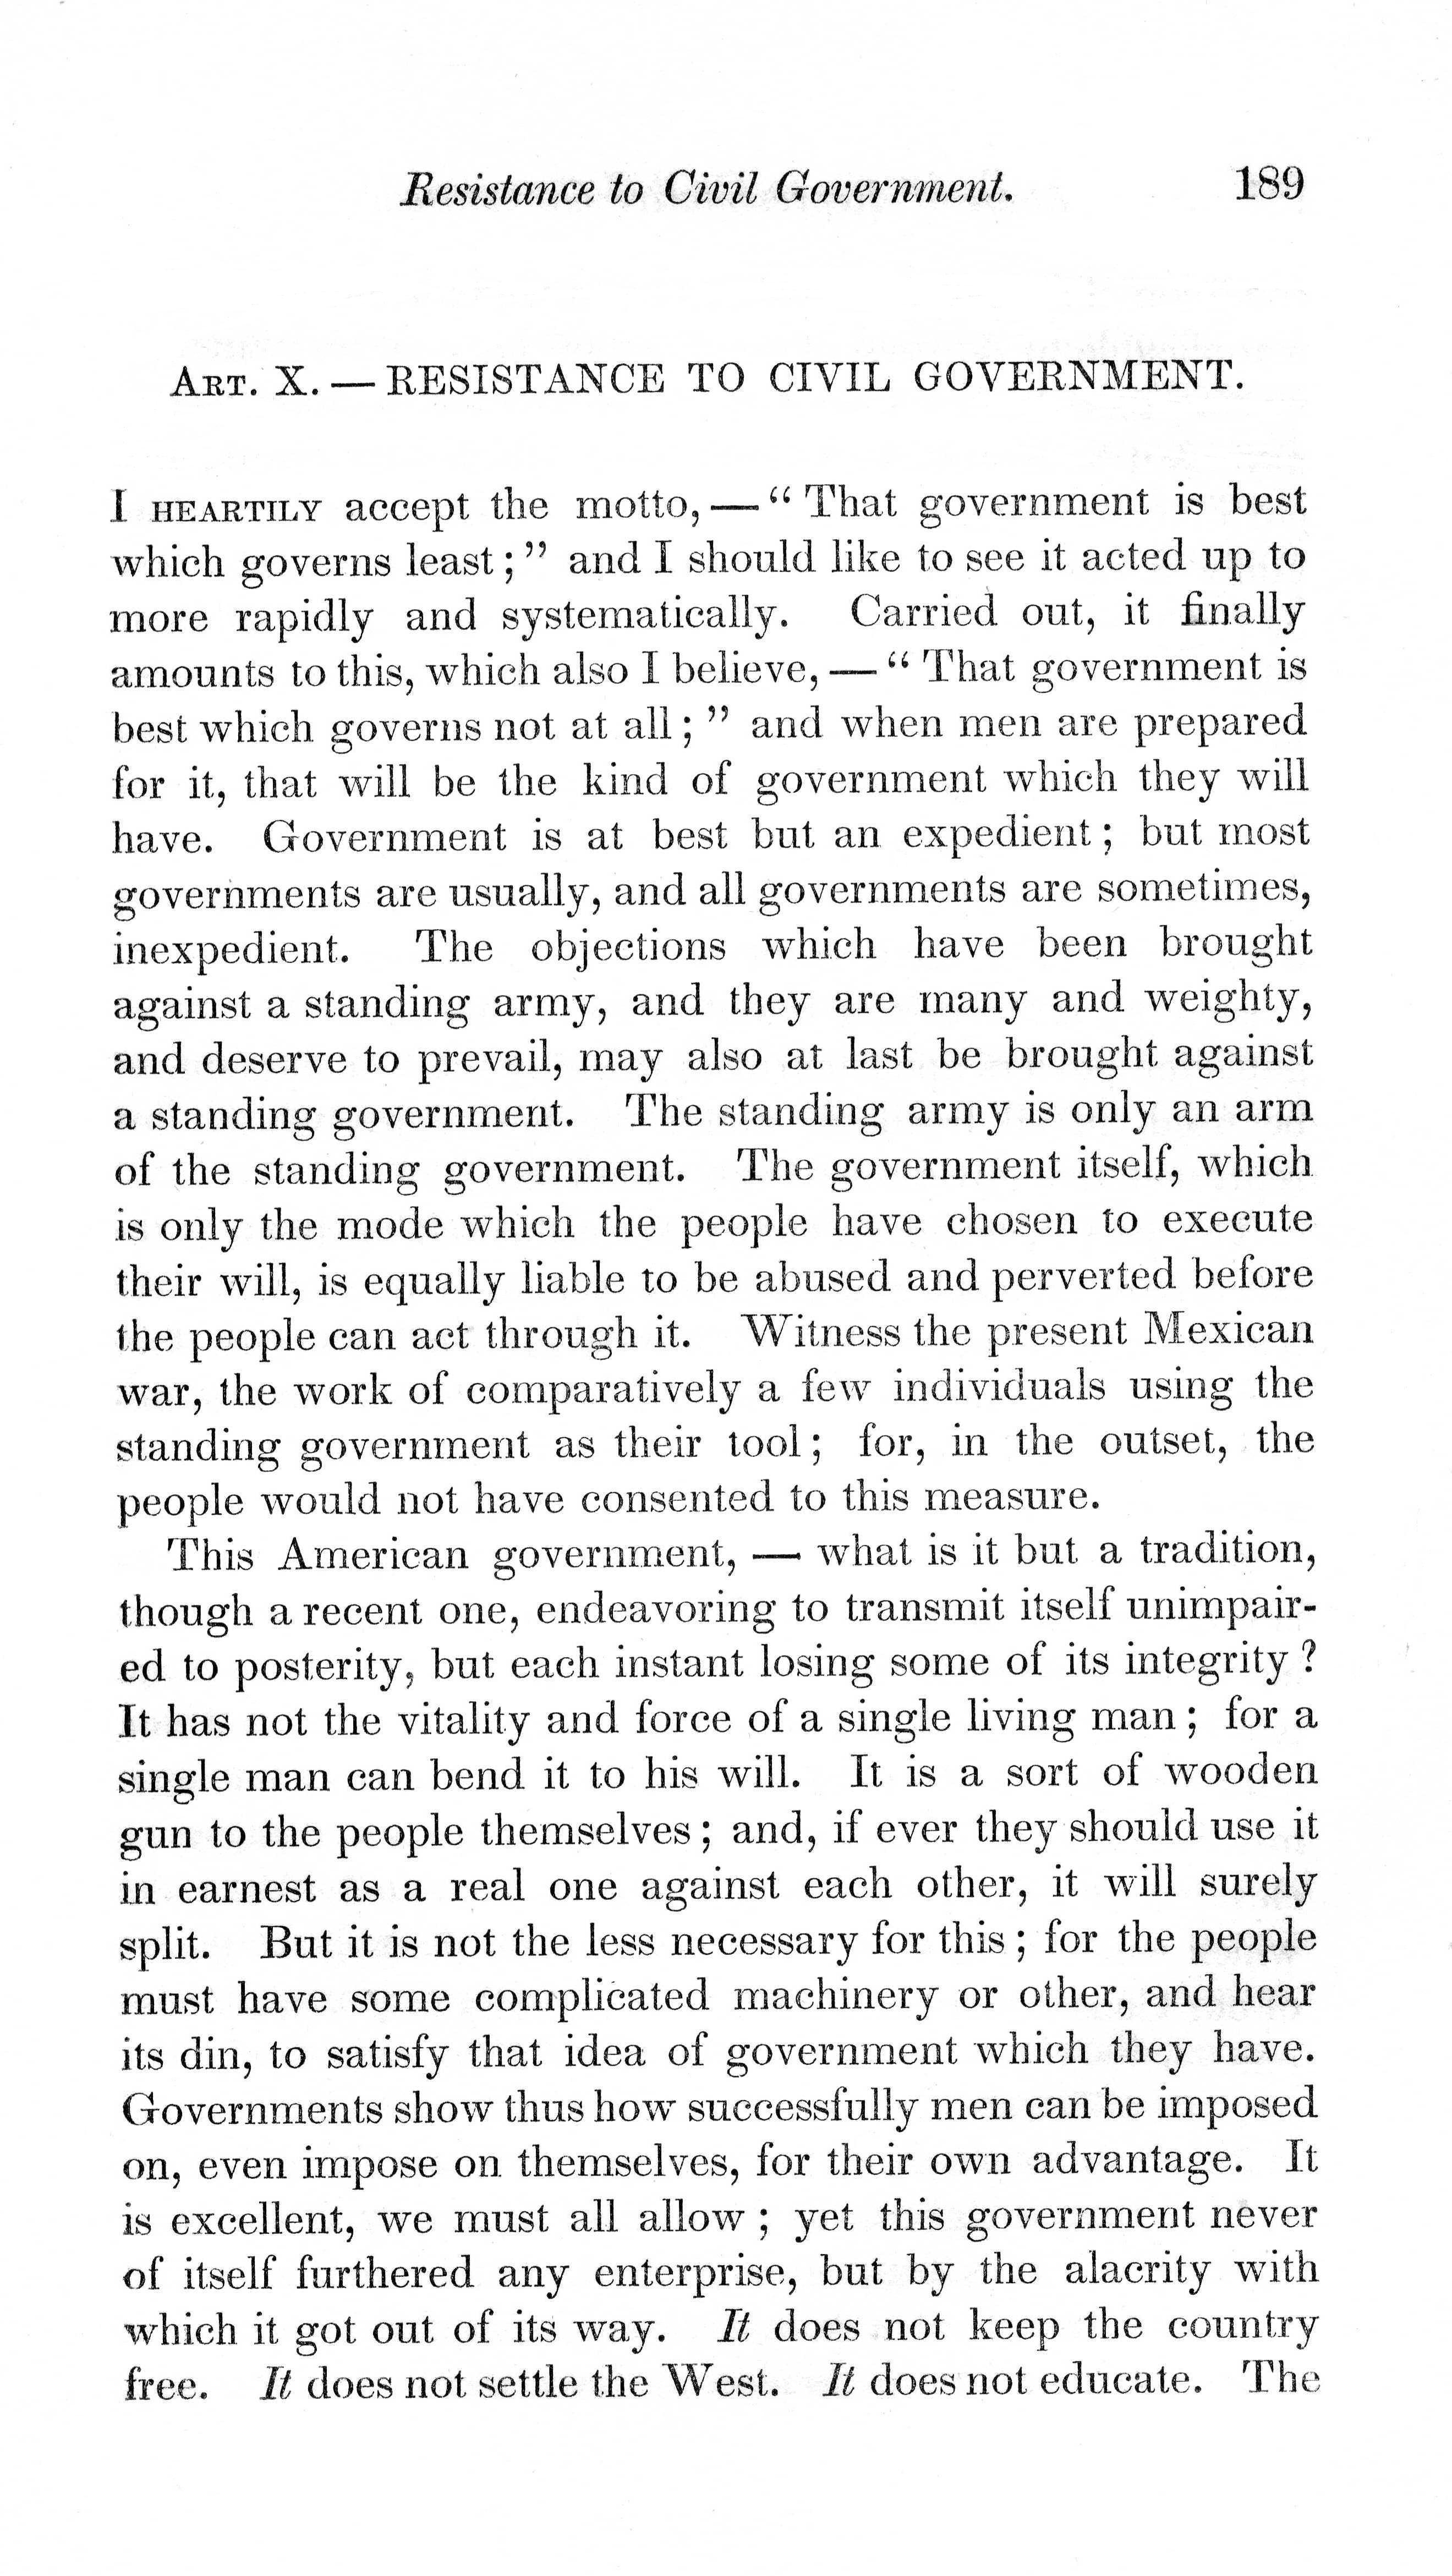 thoreau essays cramer Walden by henry david thoreau thoreau scholar jeffrey s cramer has meticulously corrected cramer also glosses walden with references to thoreau's essays.